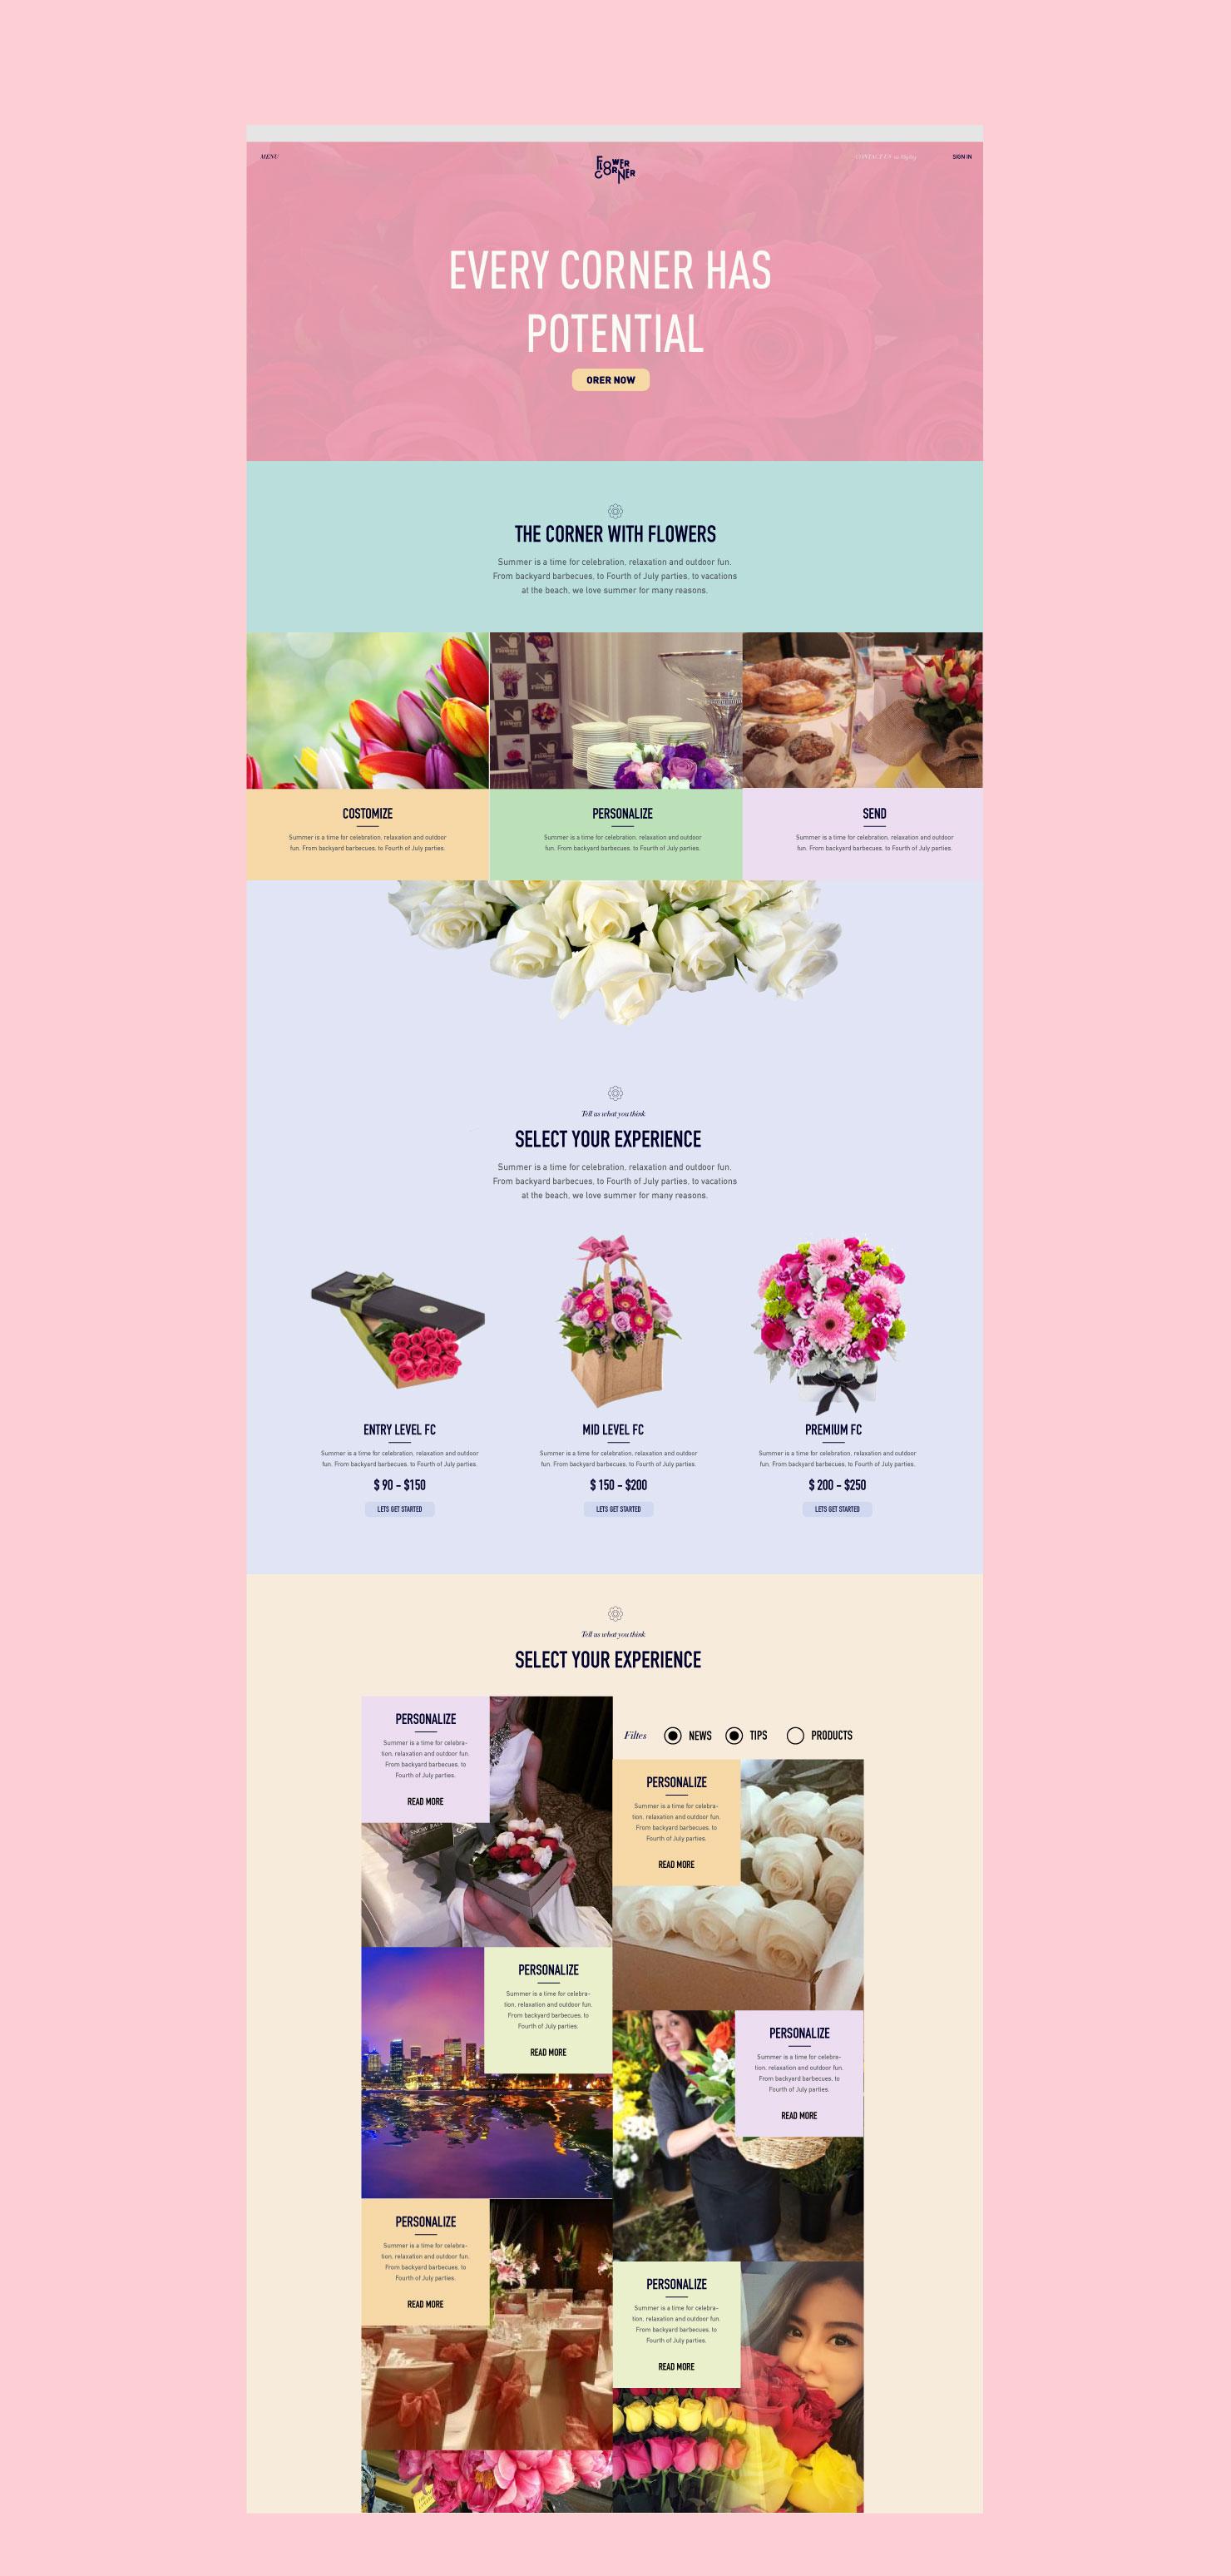 Flowercorner-brand-web-design-28